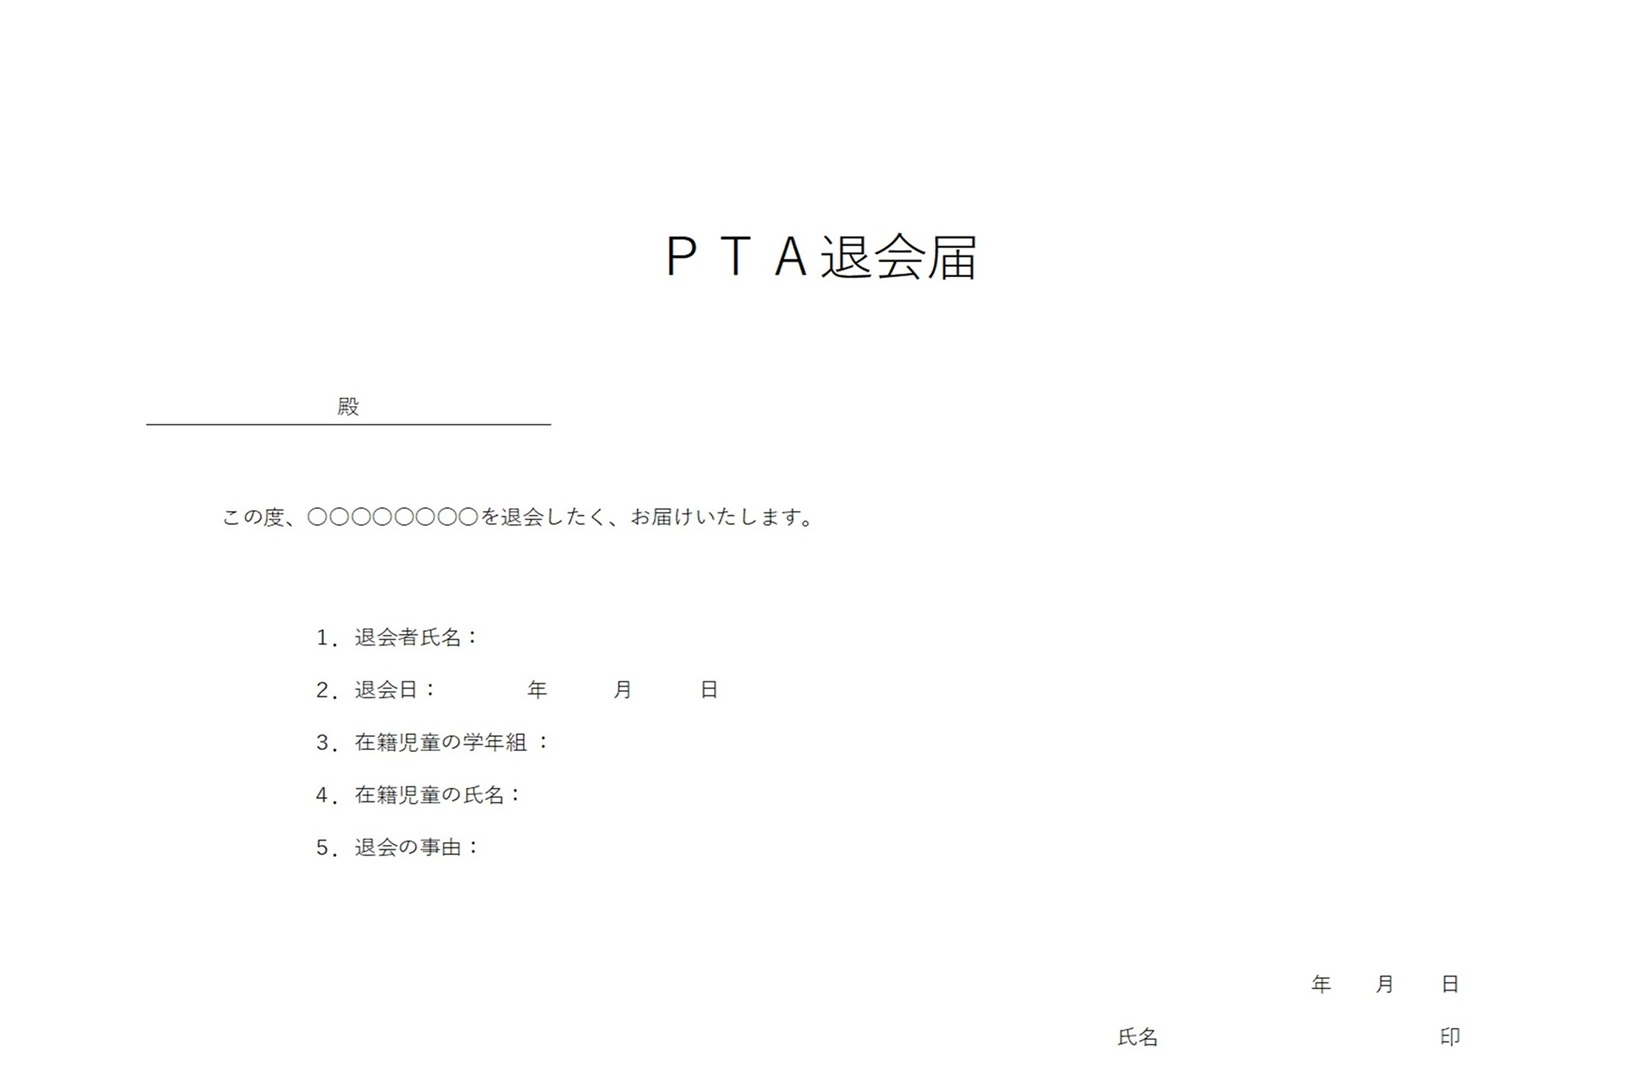 PTA・運営・引継ぎ 退会届